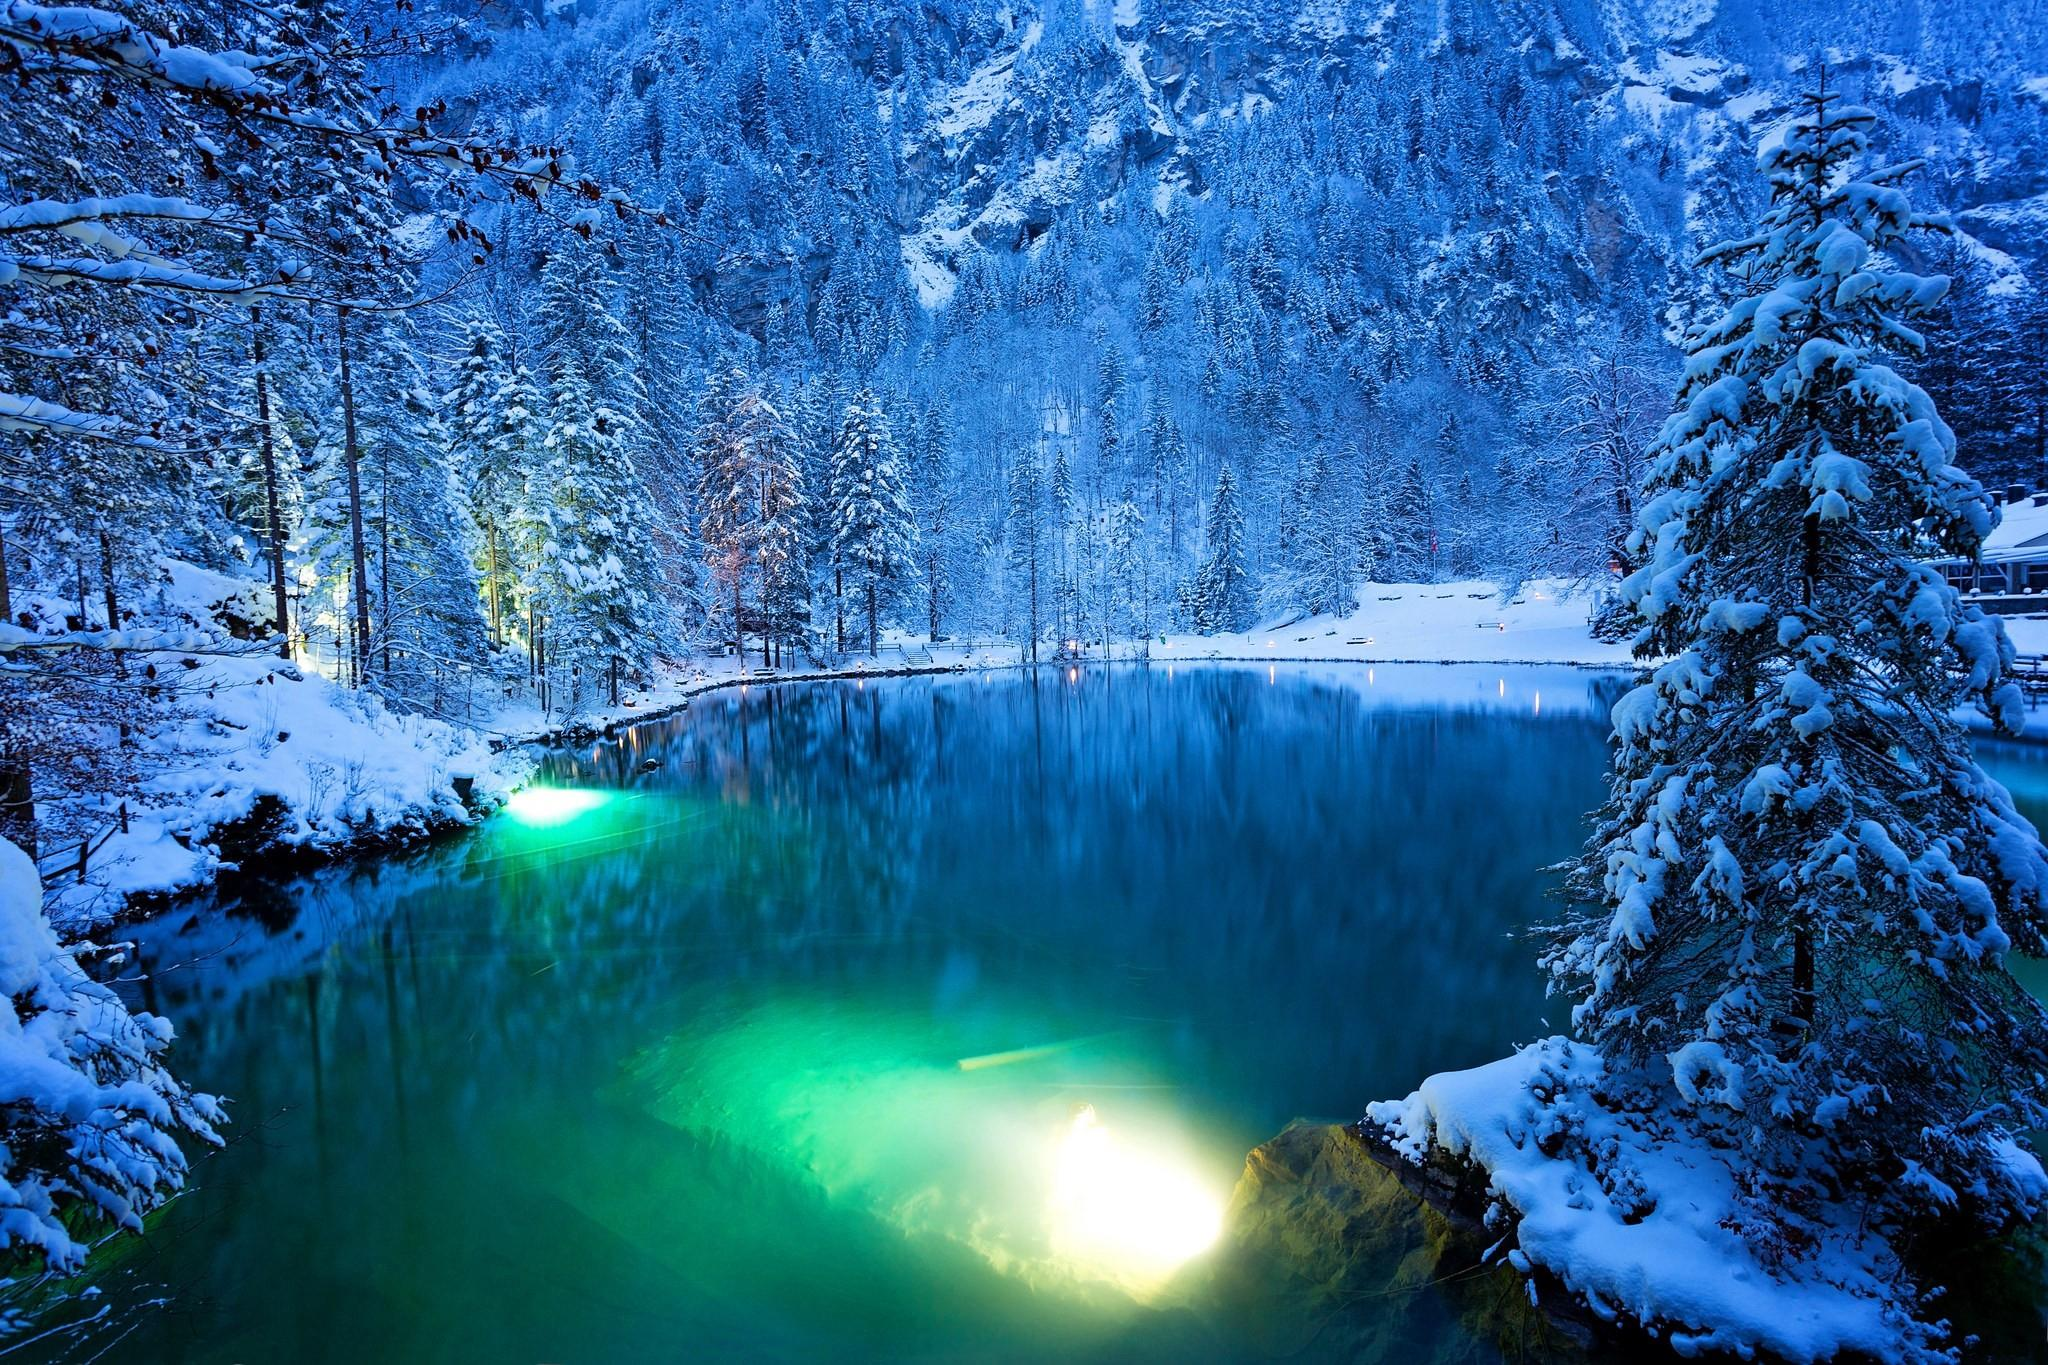 обои The Blue Lake, Blausee, Switzerland, зима картинки фото